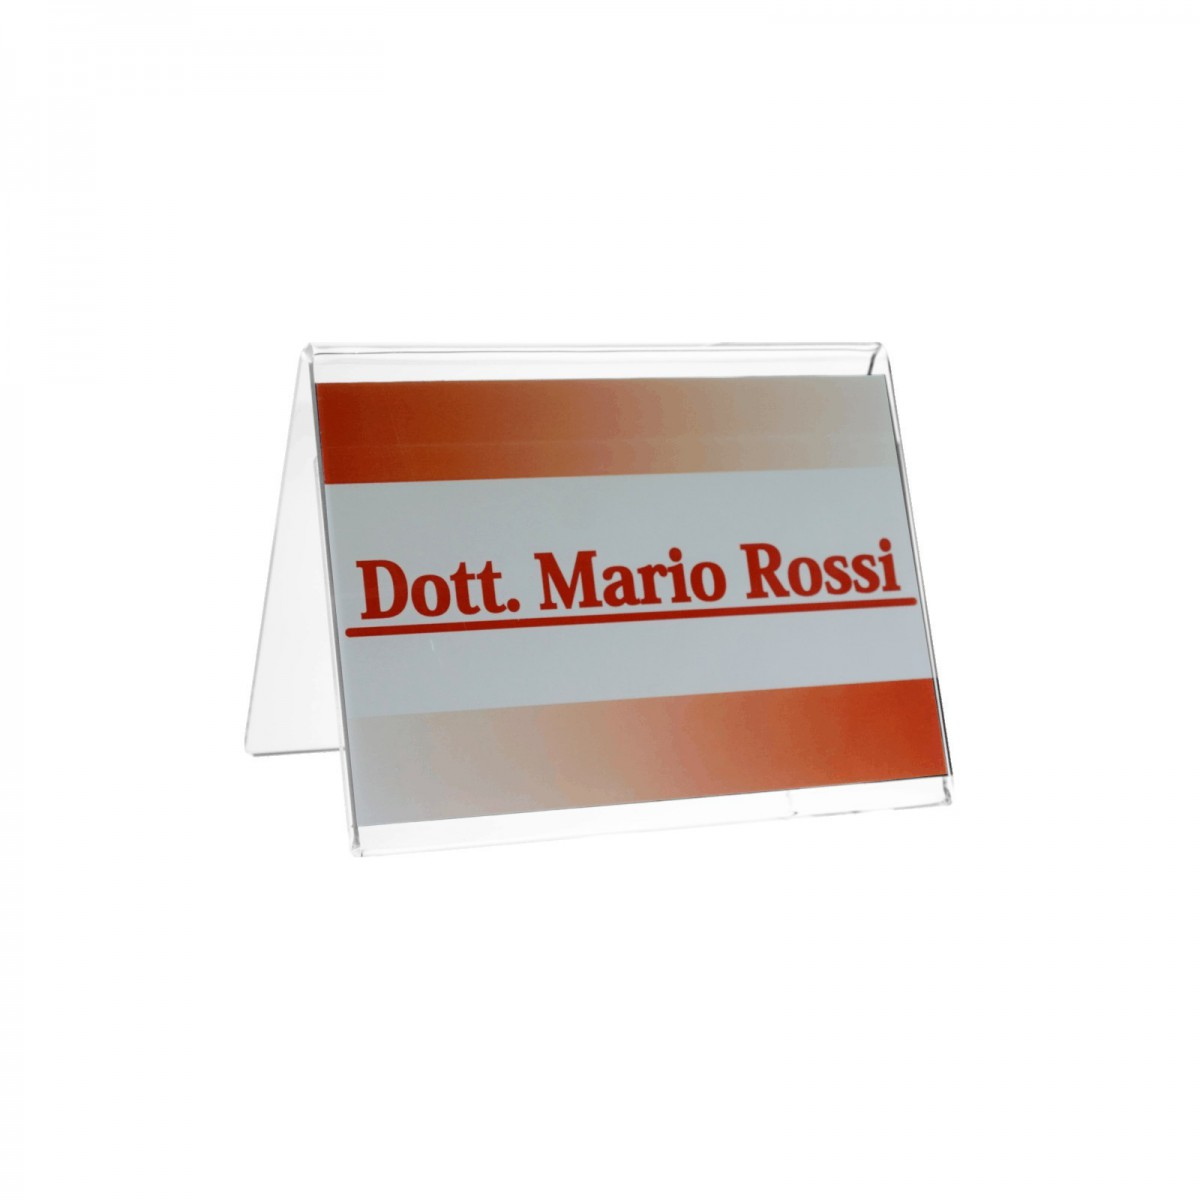 Clear Acrylic name badge